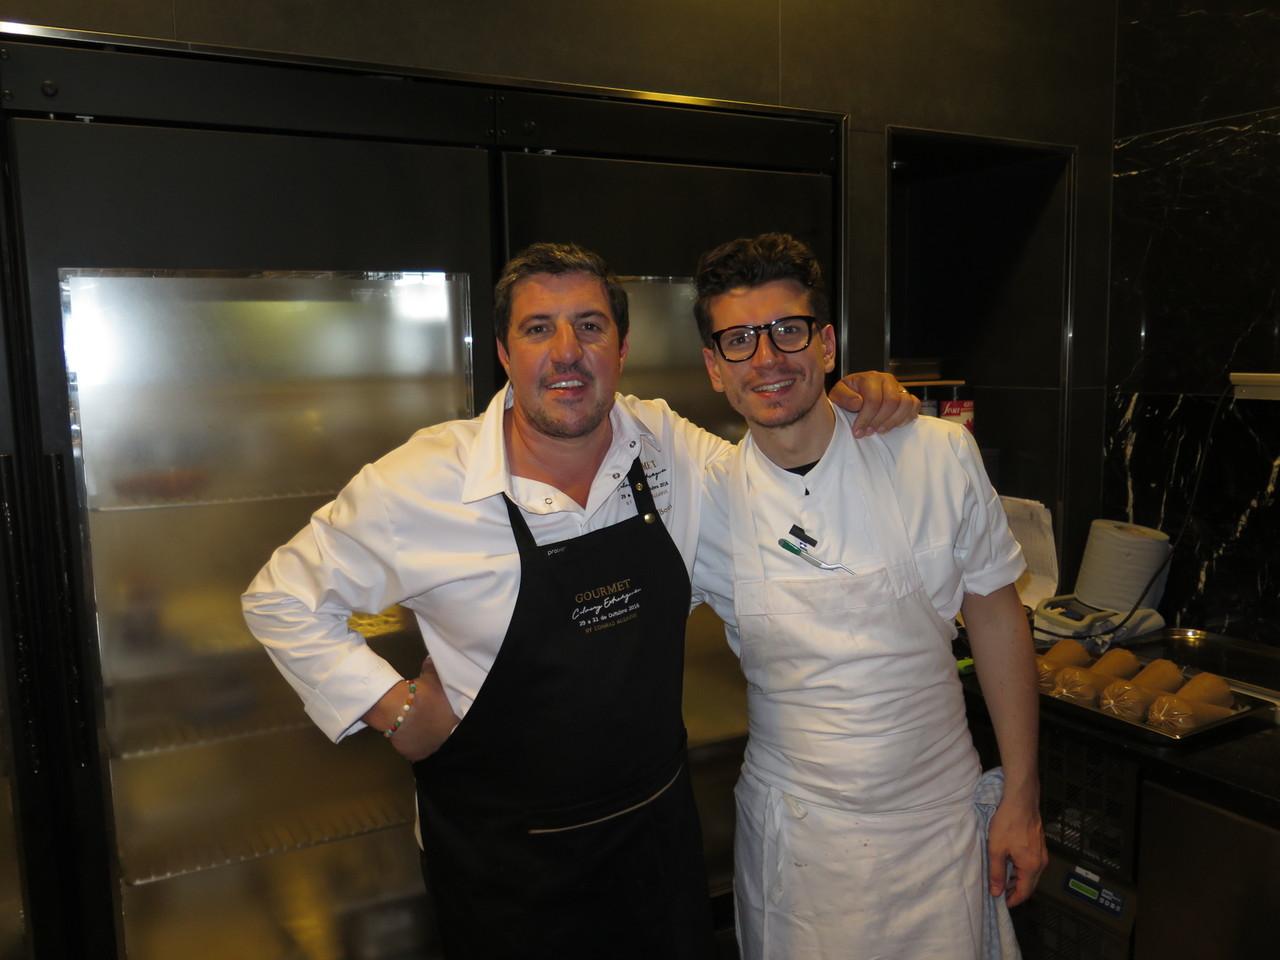 Claude Bosi e o seu Head Chef Francesco Dibenedetto